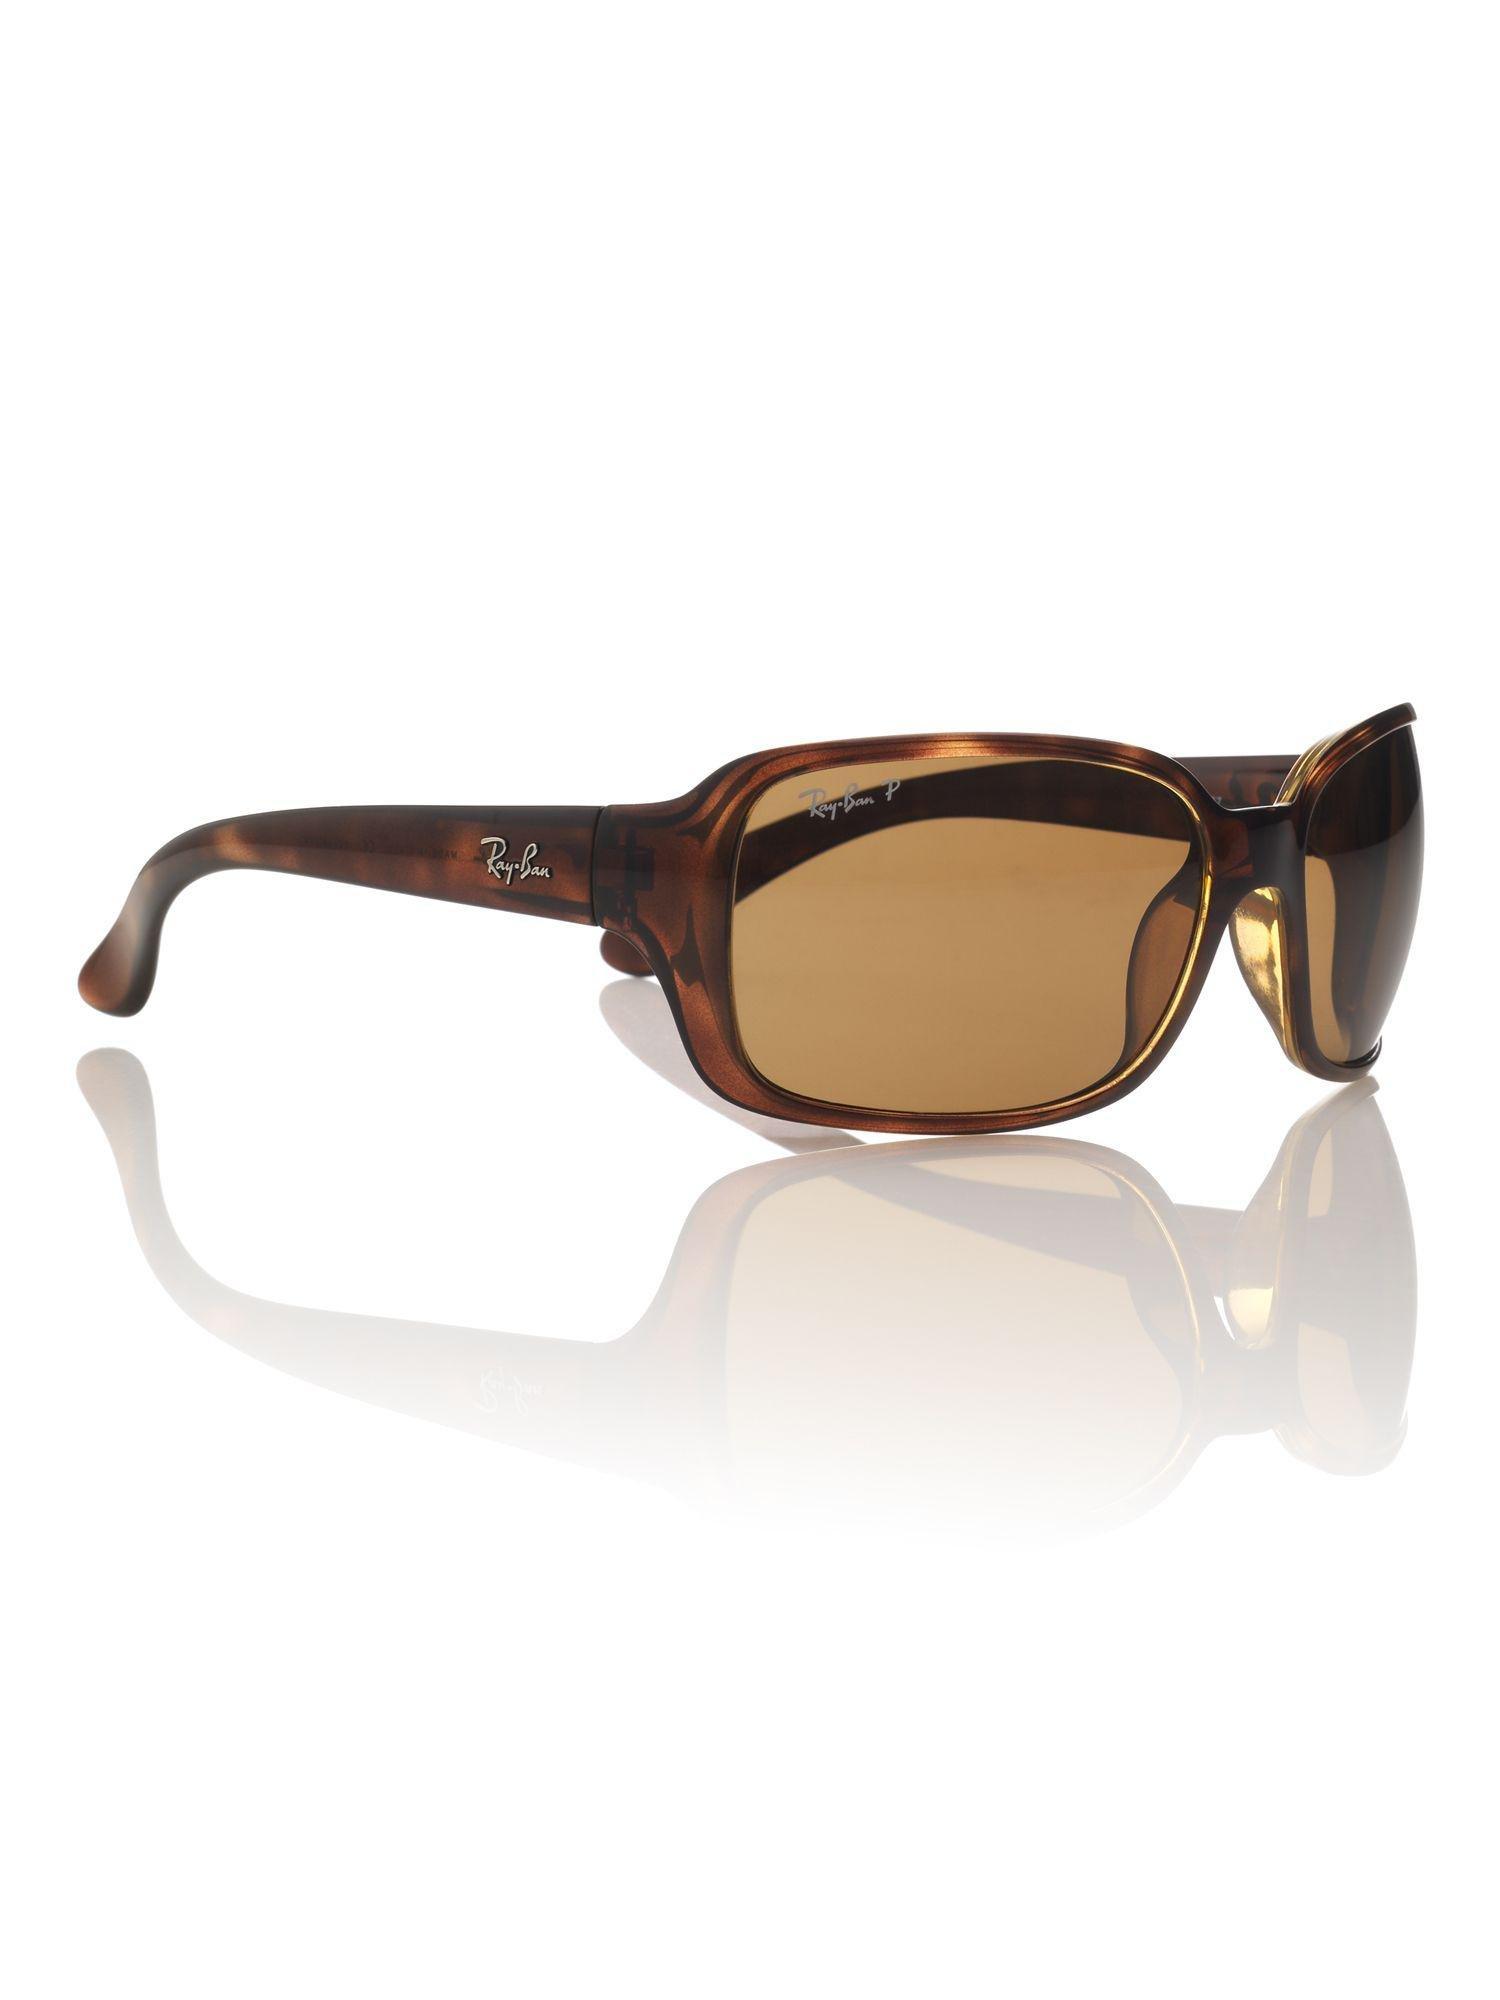 ray-ban unisex rb4068 square sunglasses